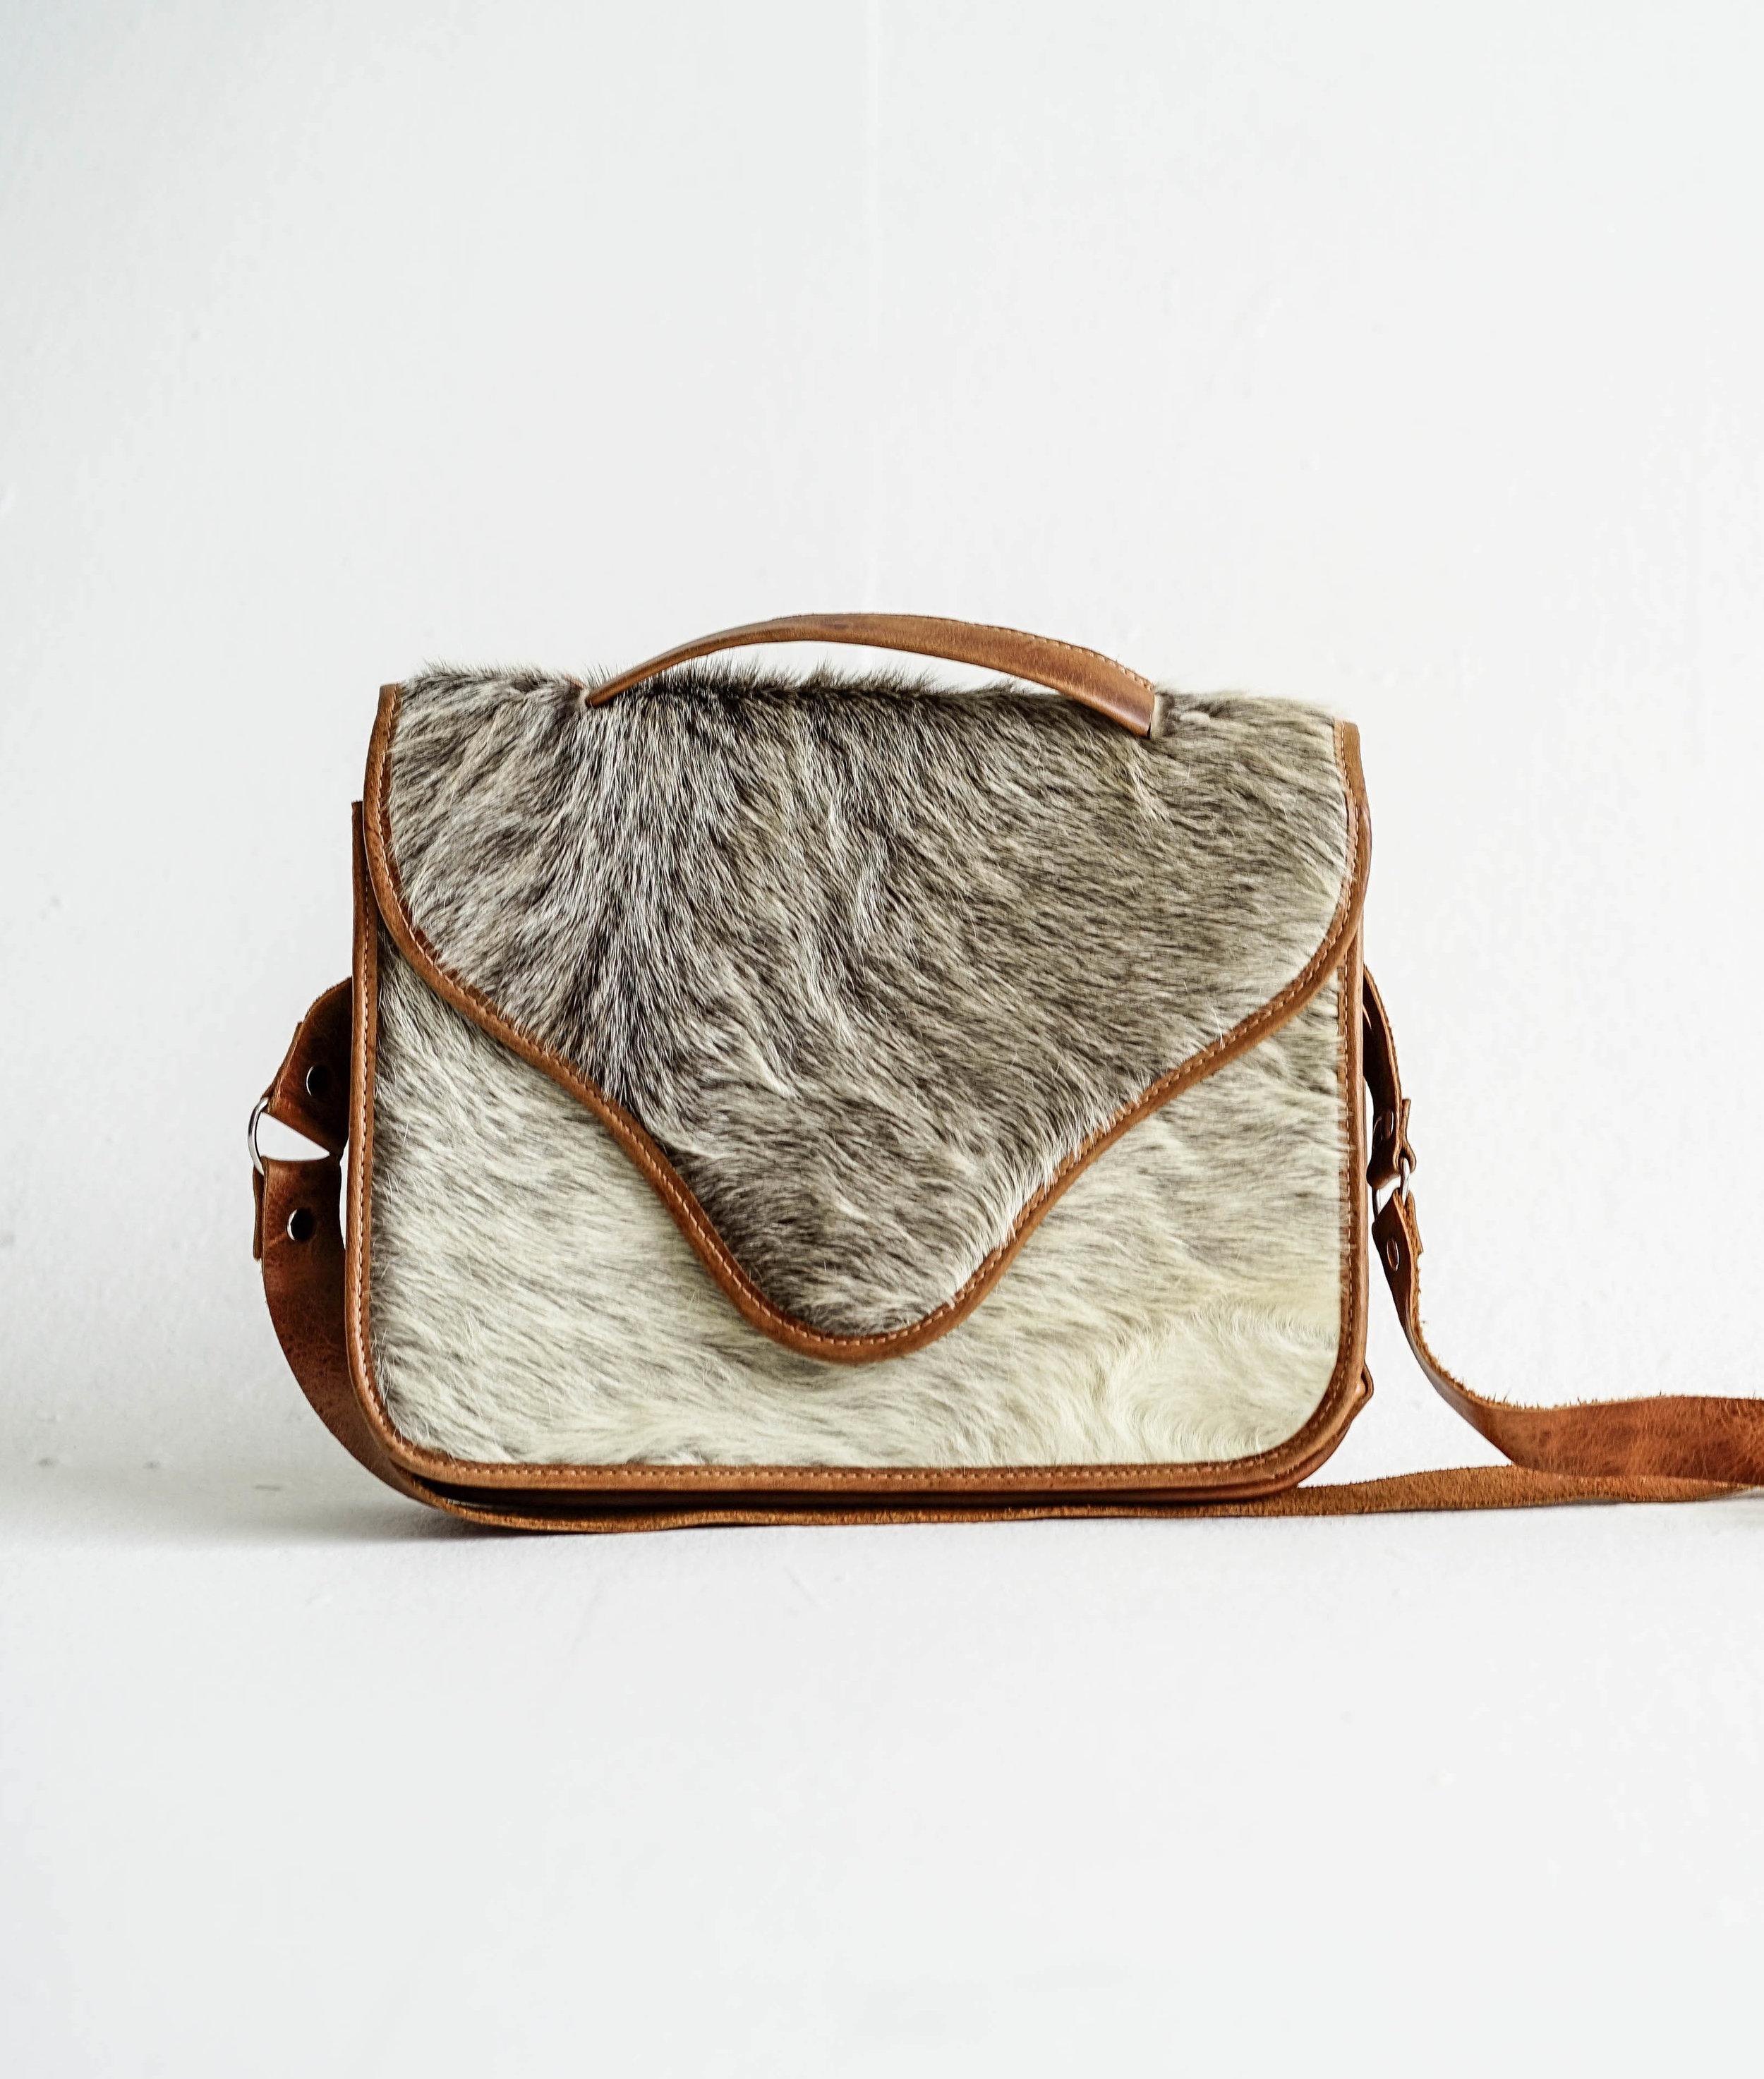 Hazlo Handmade Guatemala Fair Trade Hand Woven Leather Bags Accessories Belts Antigua Slow Fashion Purse Jewelry01403 copy.jpg